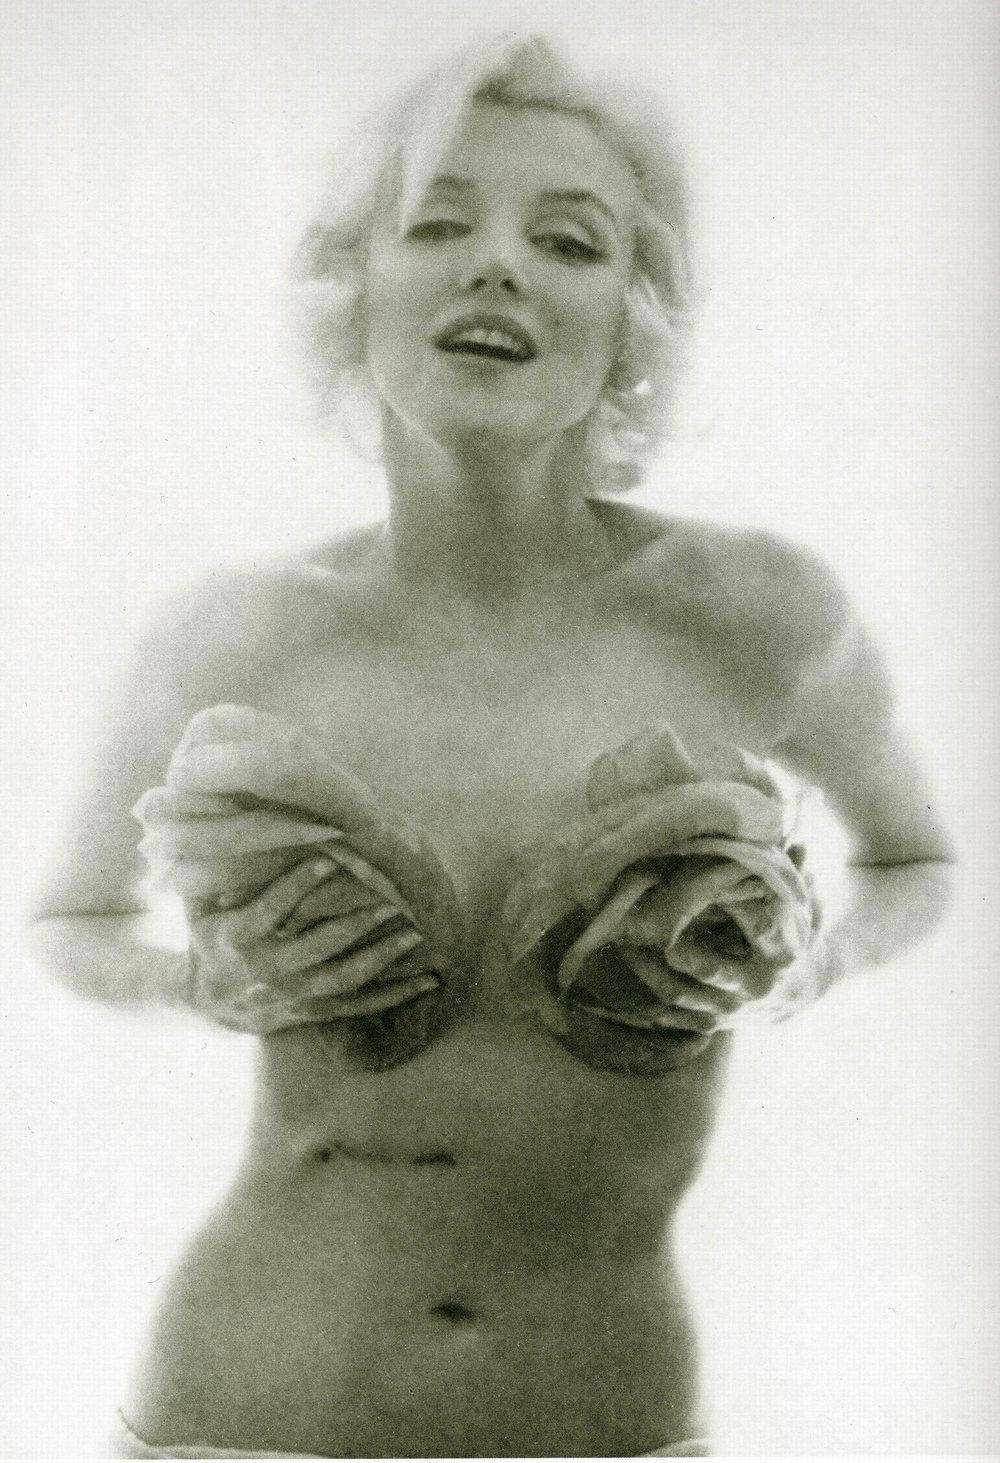 Marilyn Monroe Bert Stern 1962 roses 2.jpg